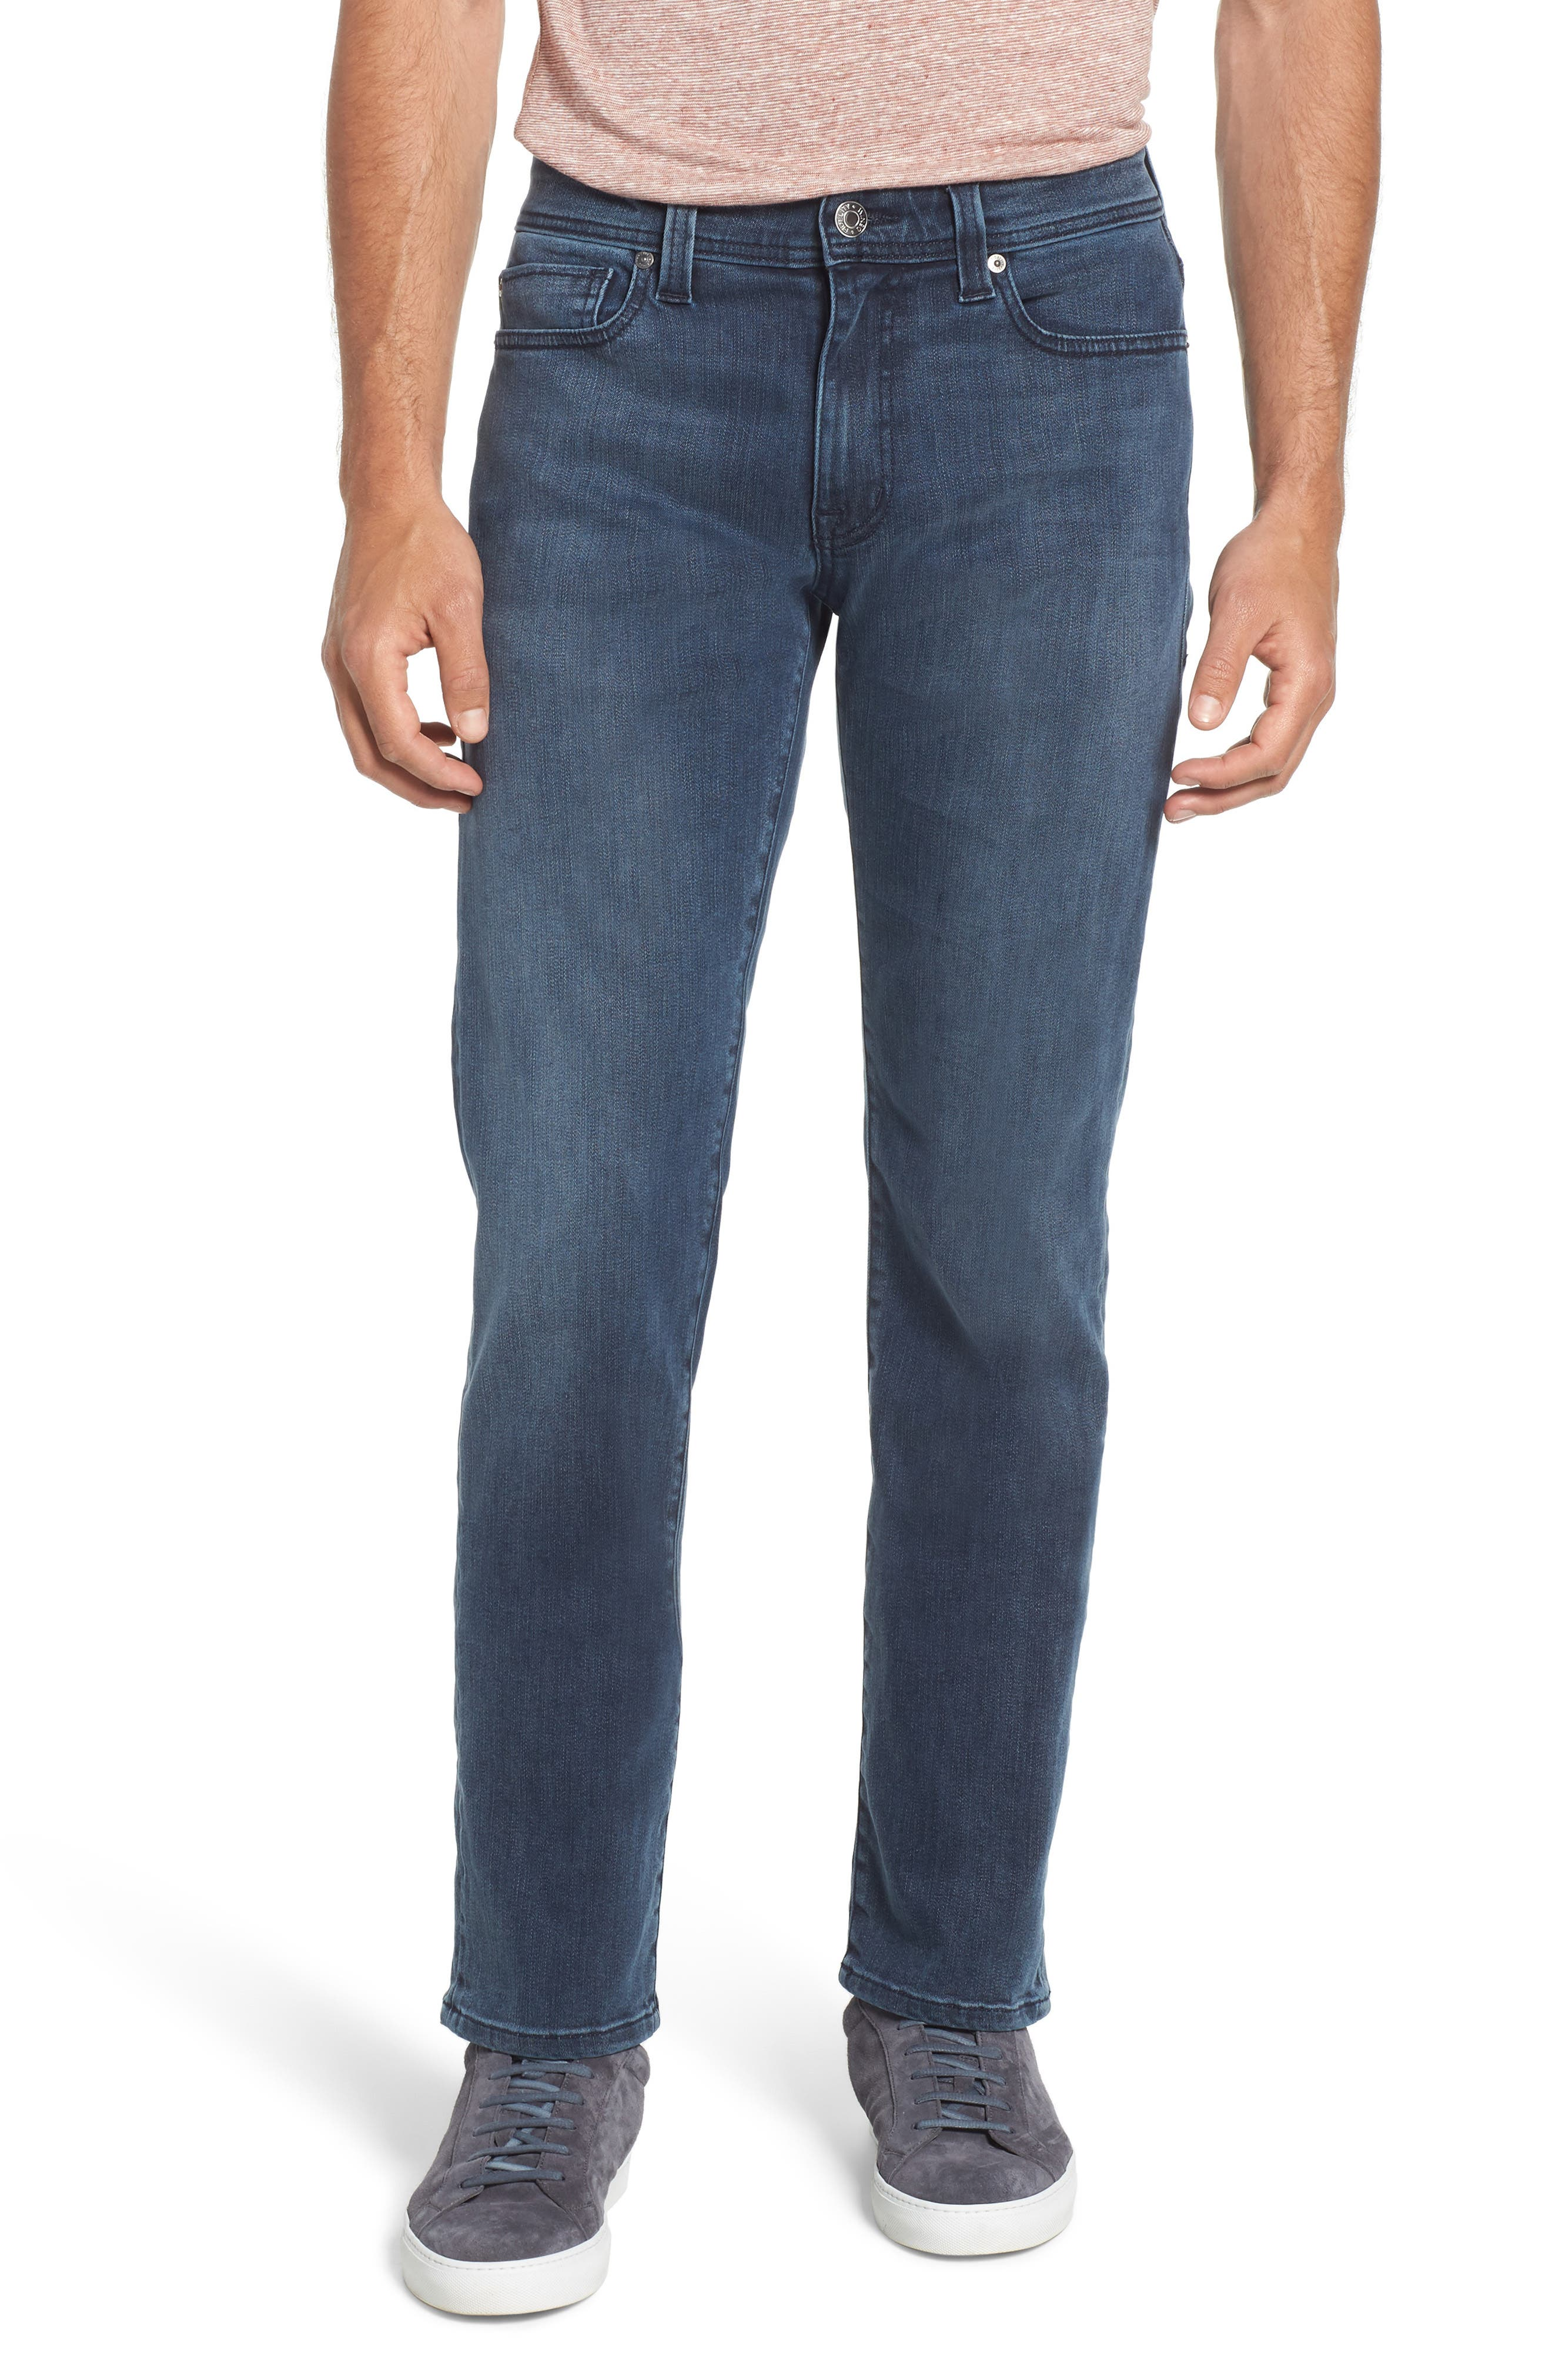 Jimmy Slim Straight Leg Jeans,                             Main thumbnail 1, color,                             Lexicon